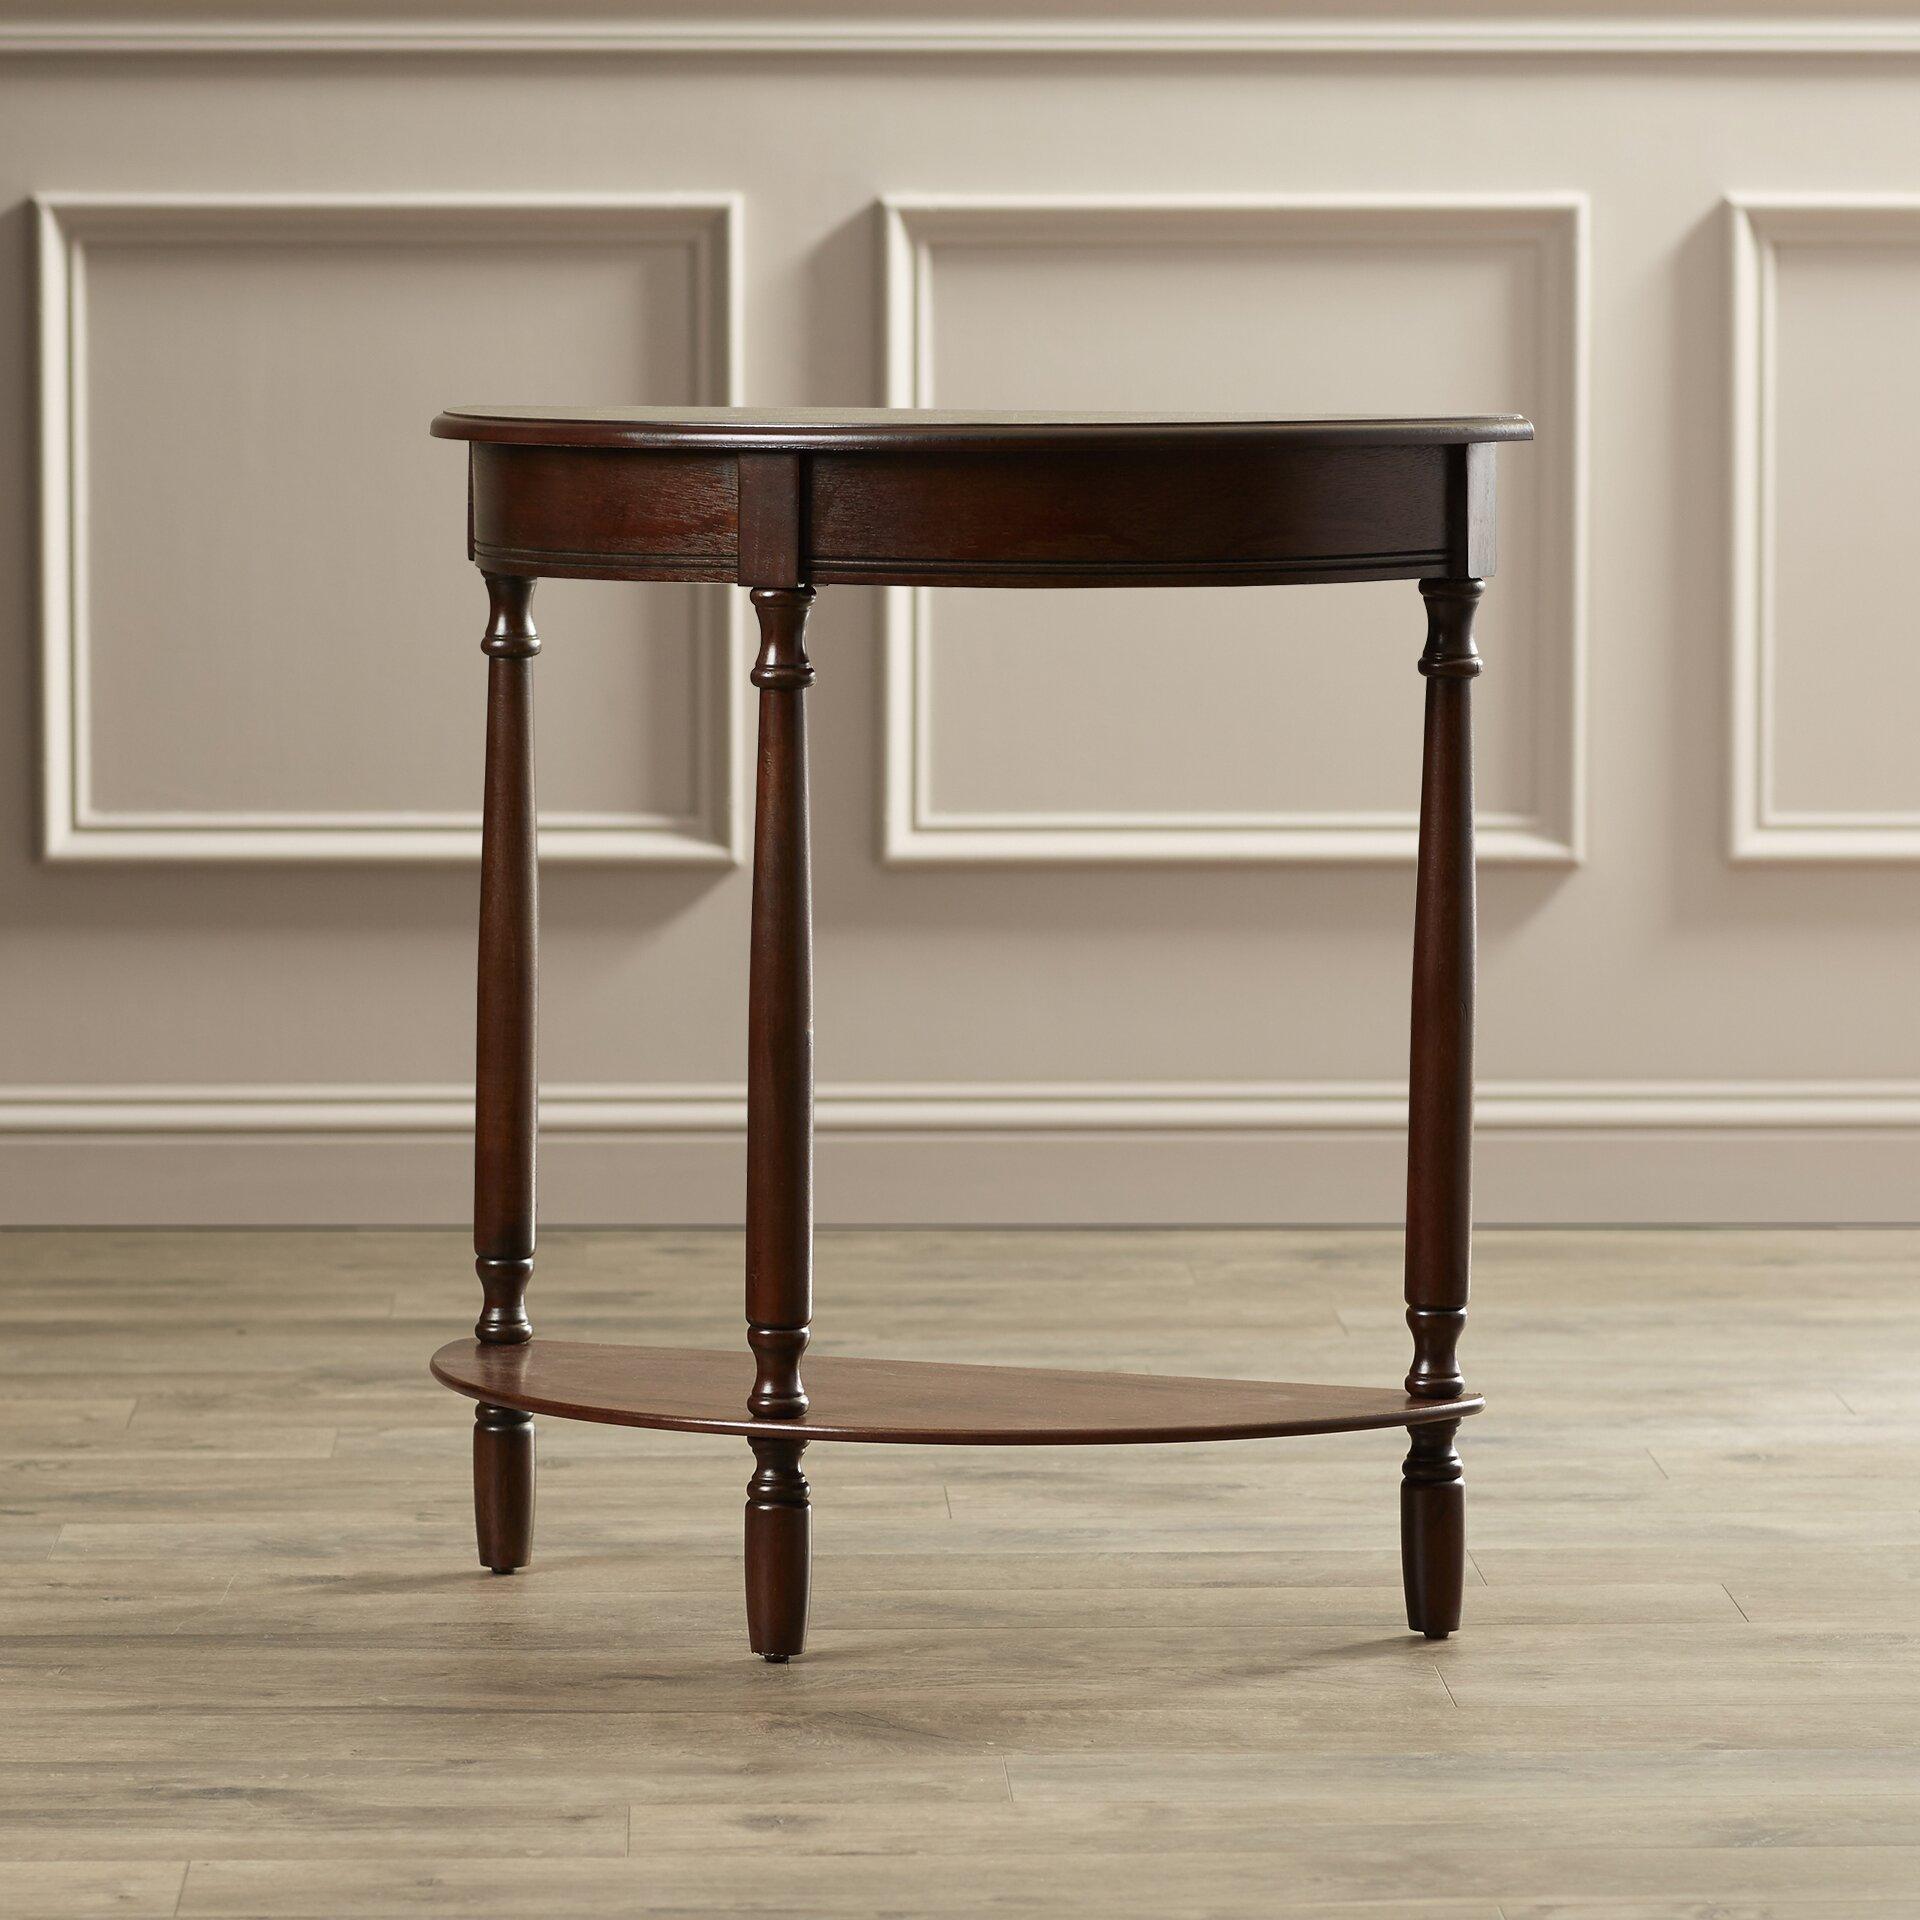 charlton home spelman crescent half moon console table reviews wayfair. Black Bedroom Furniture Sets. Home Design Ideas